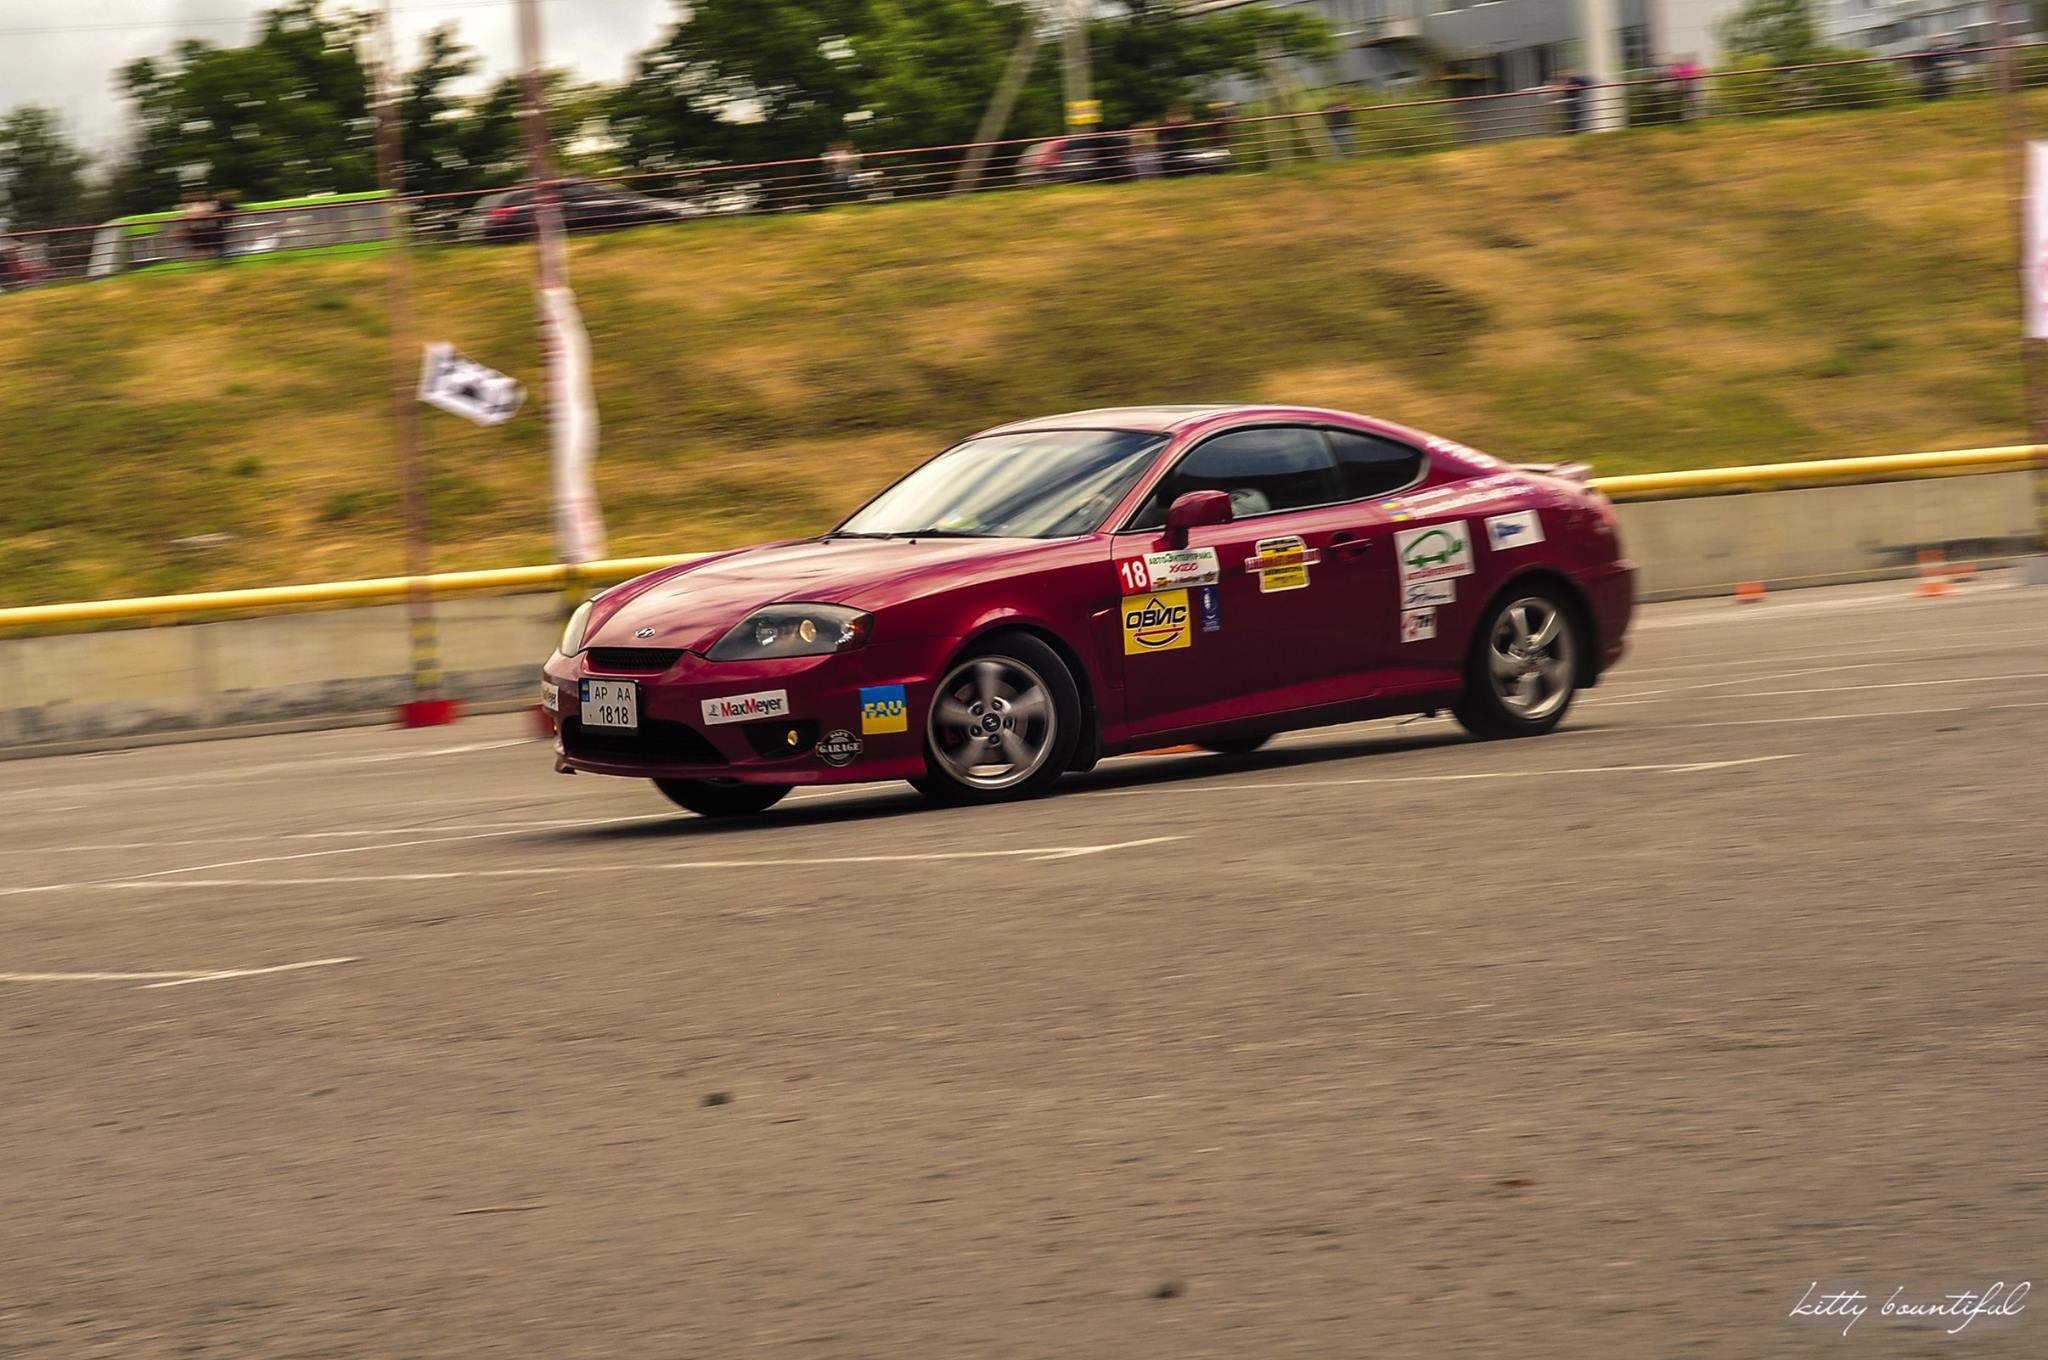 Водитель: Тимощук Александр<br/>Штурман: Набатова Валерия<br/>Машина: Hyundai Tiburon (2006г., 1975см³)<br/>Класс: N4<br/>Стартовый №: 418